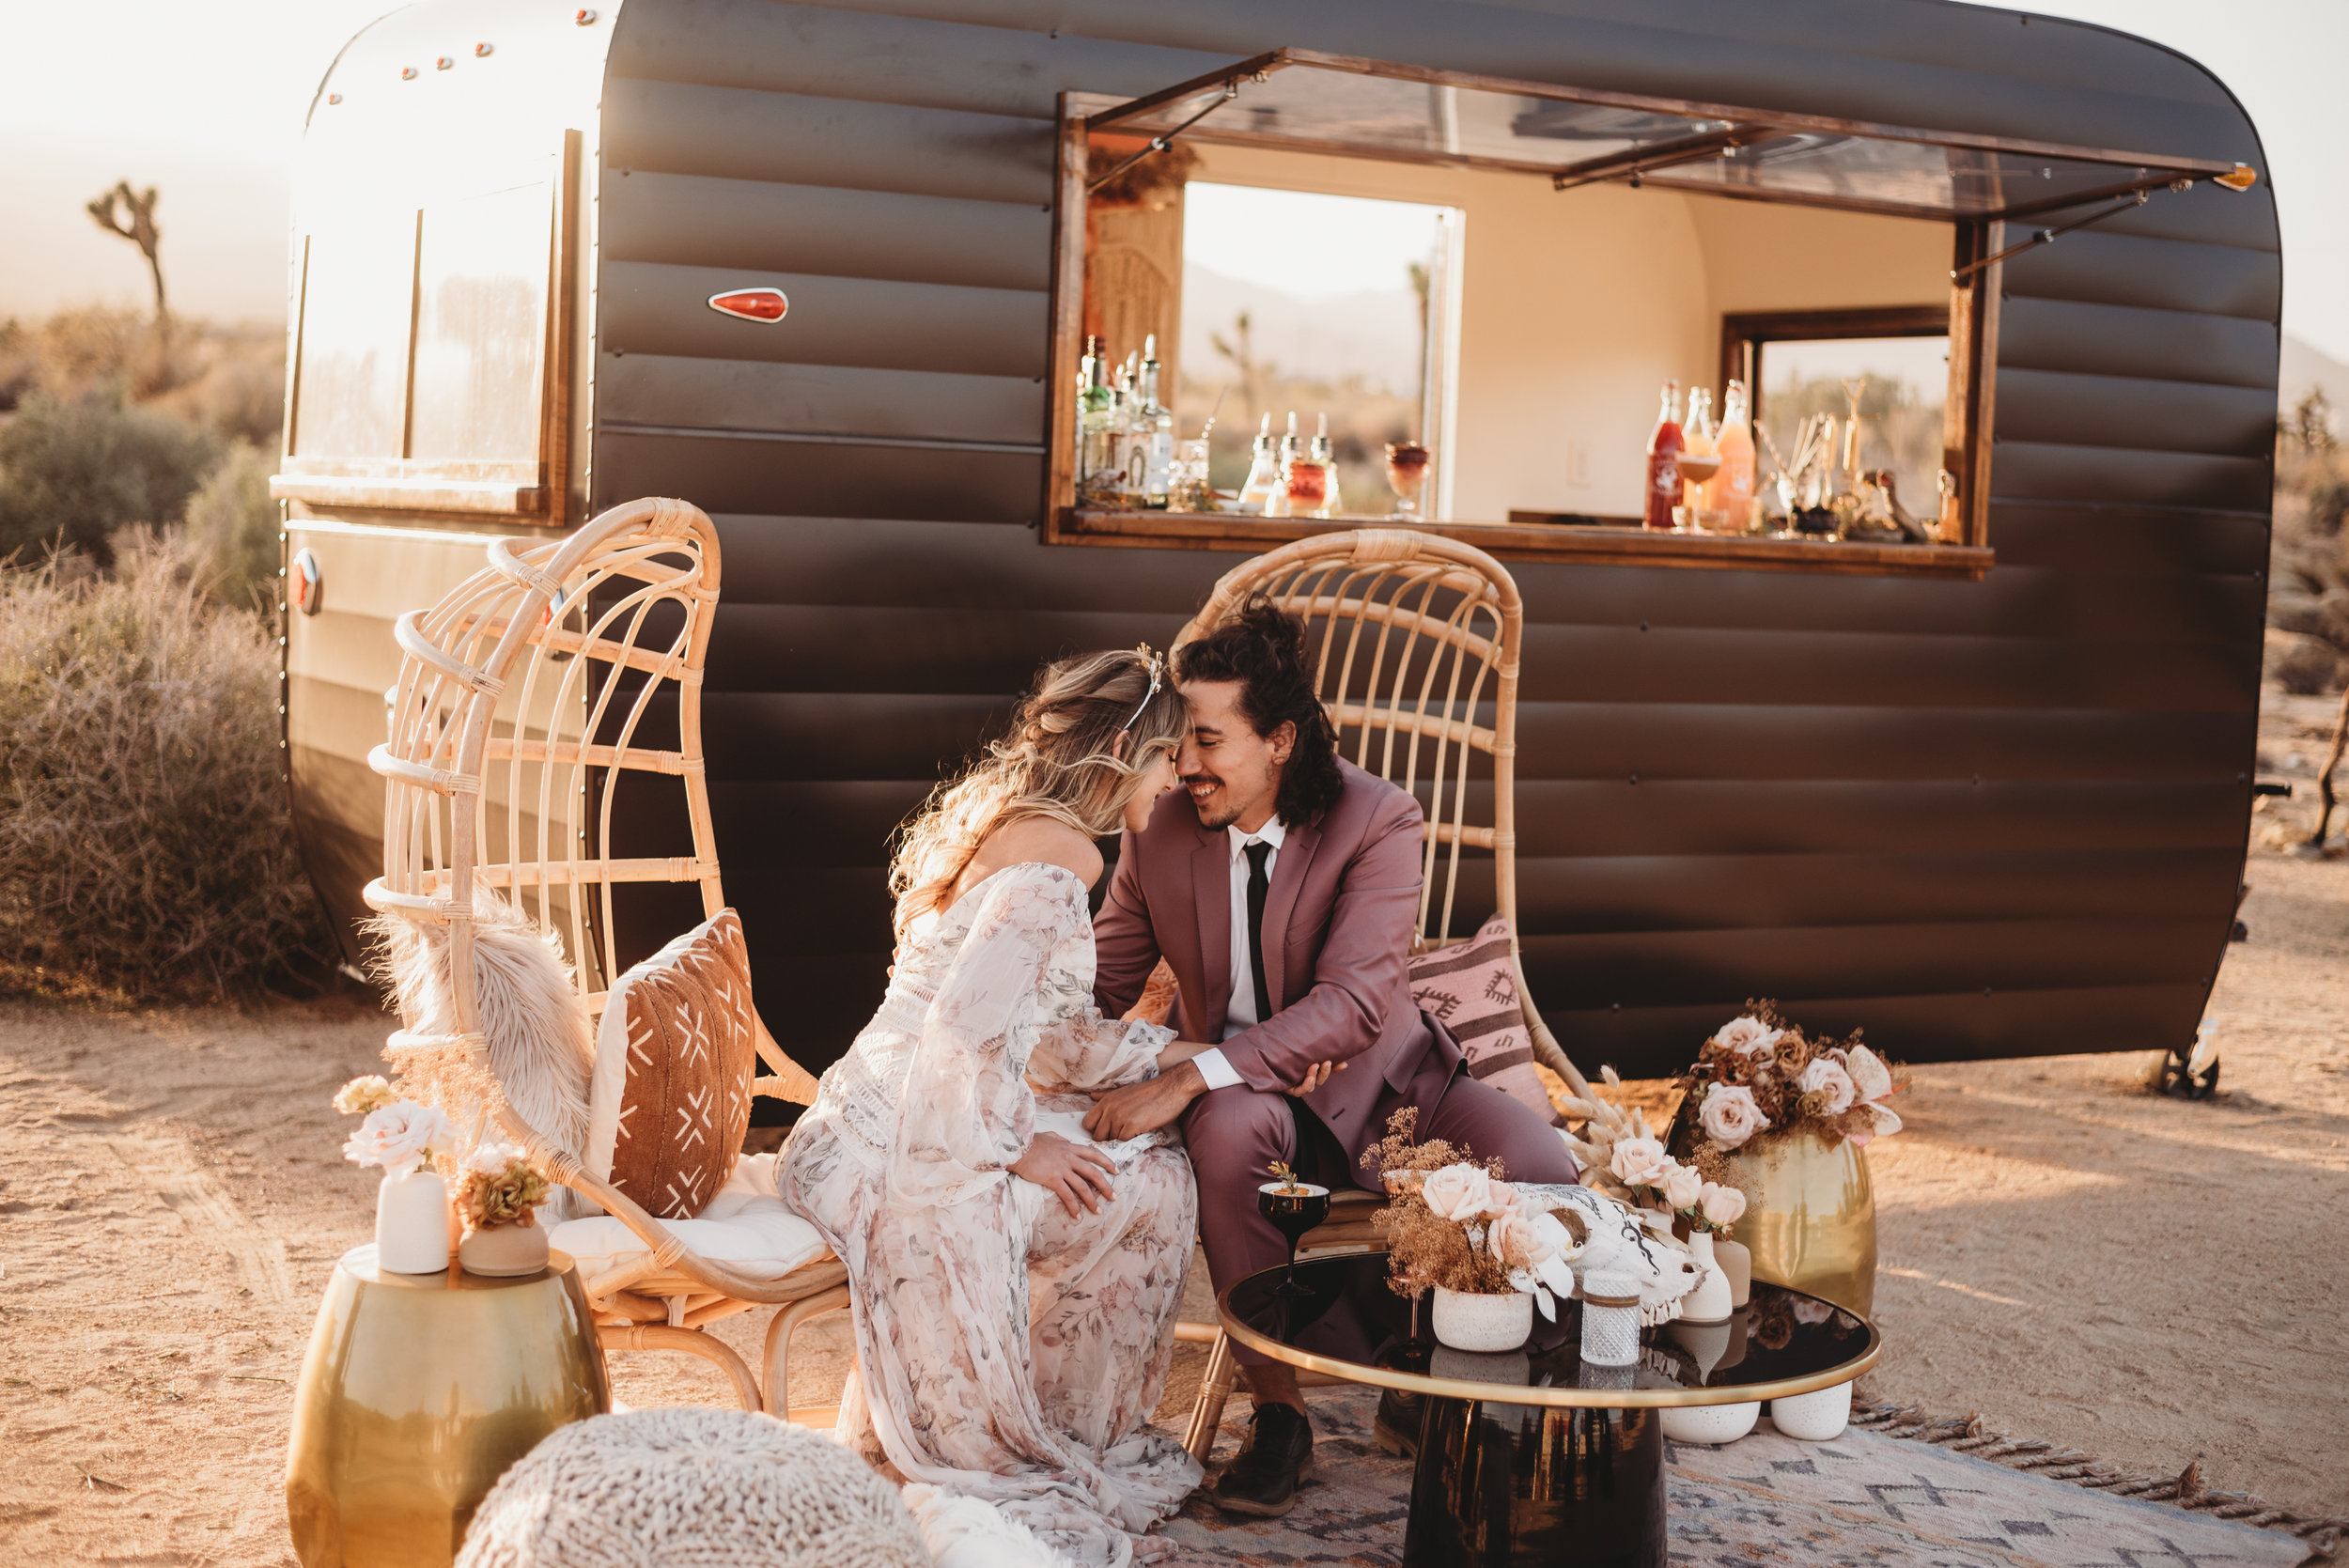 FortSt.John_photographer_TyraEPhotography_Wedding_Couple_Family_Photograhy_DawsonCreek_Elopement_Bride_Boduoir_Portraits-8305.jpg